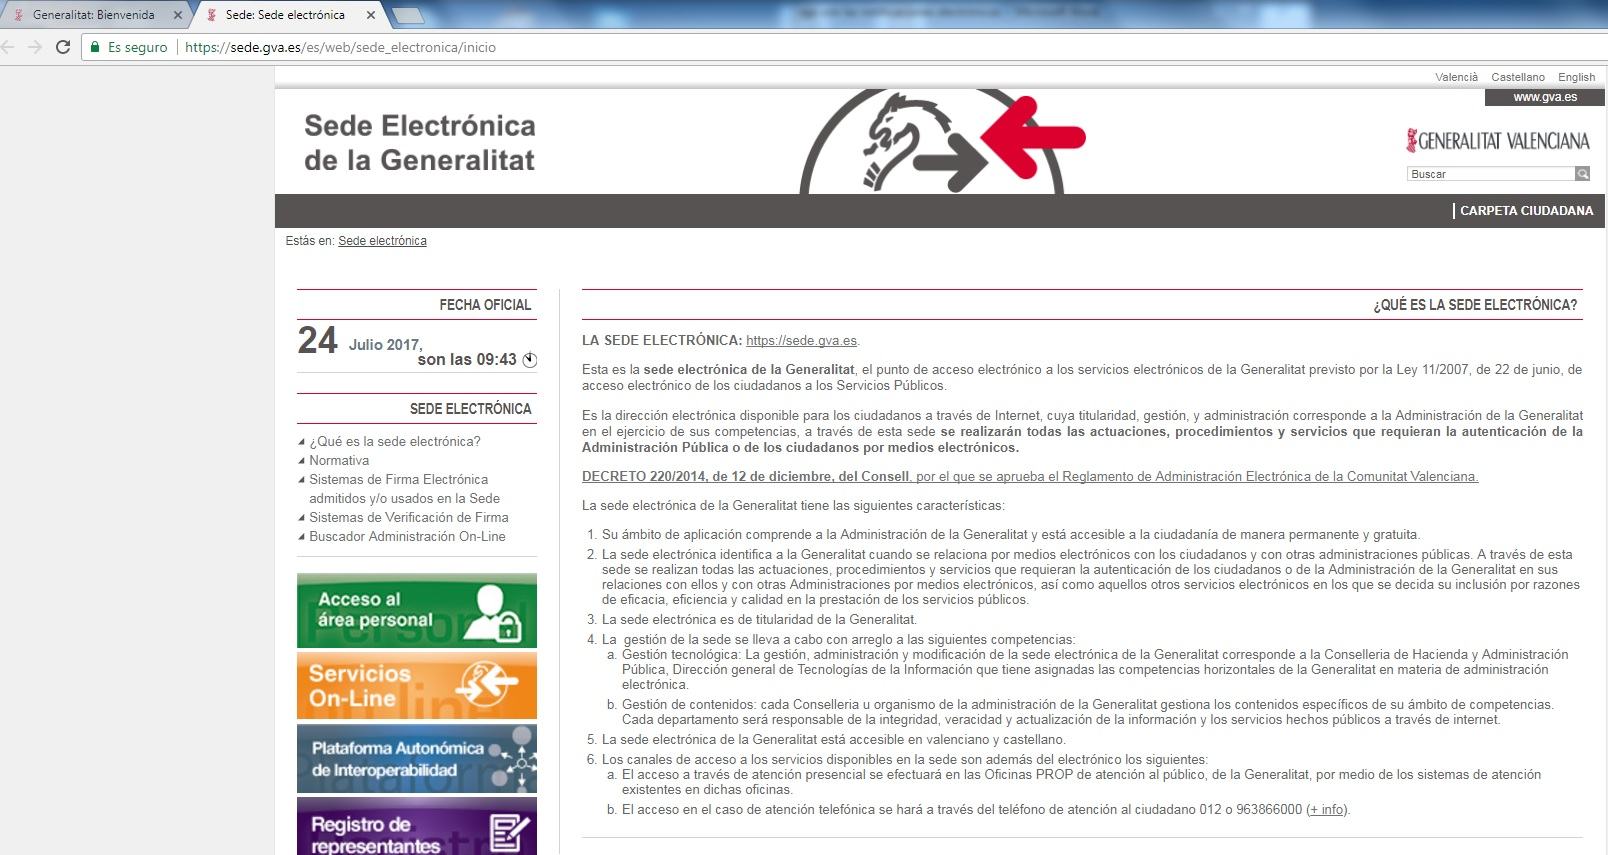 Sede electrónica de la Generalitat